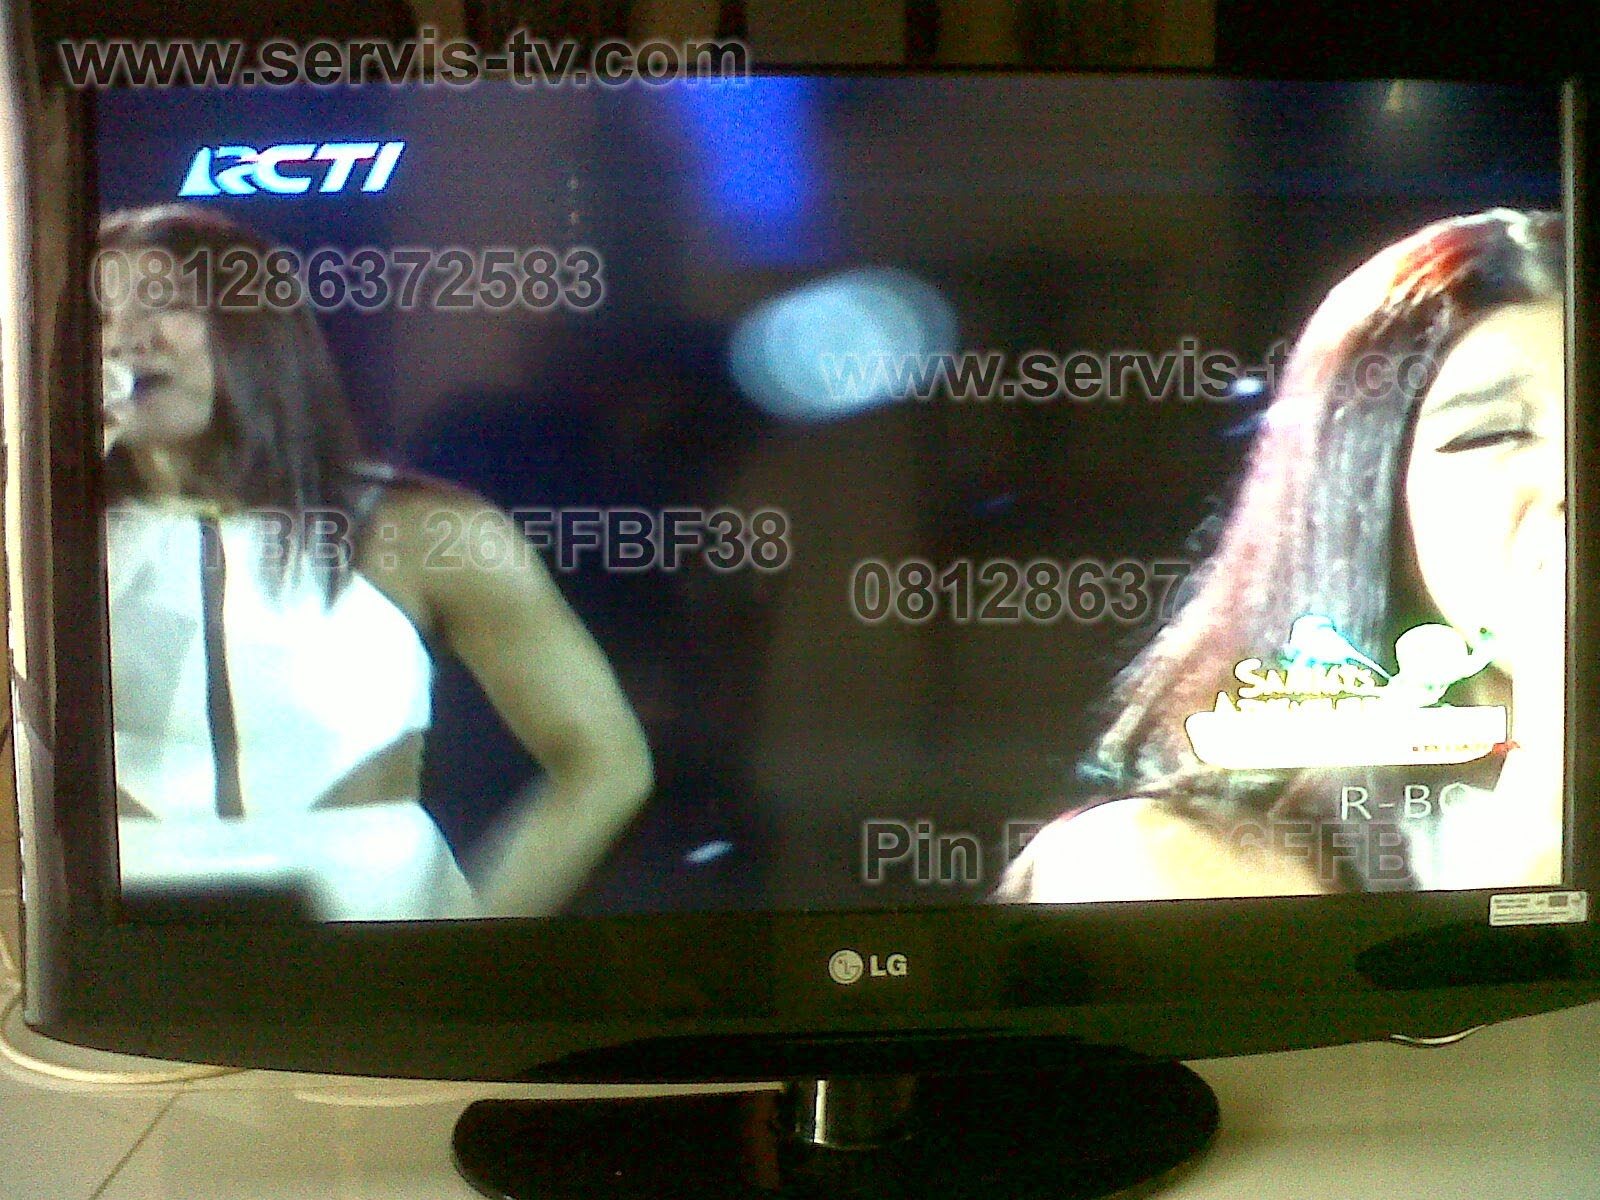 Service LG TV